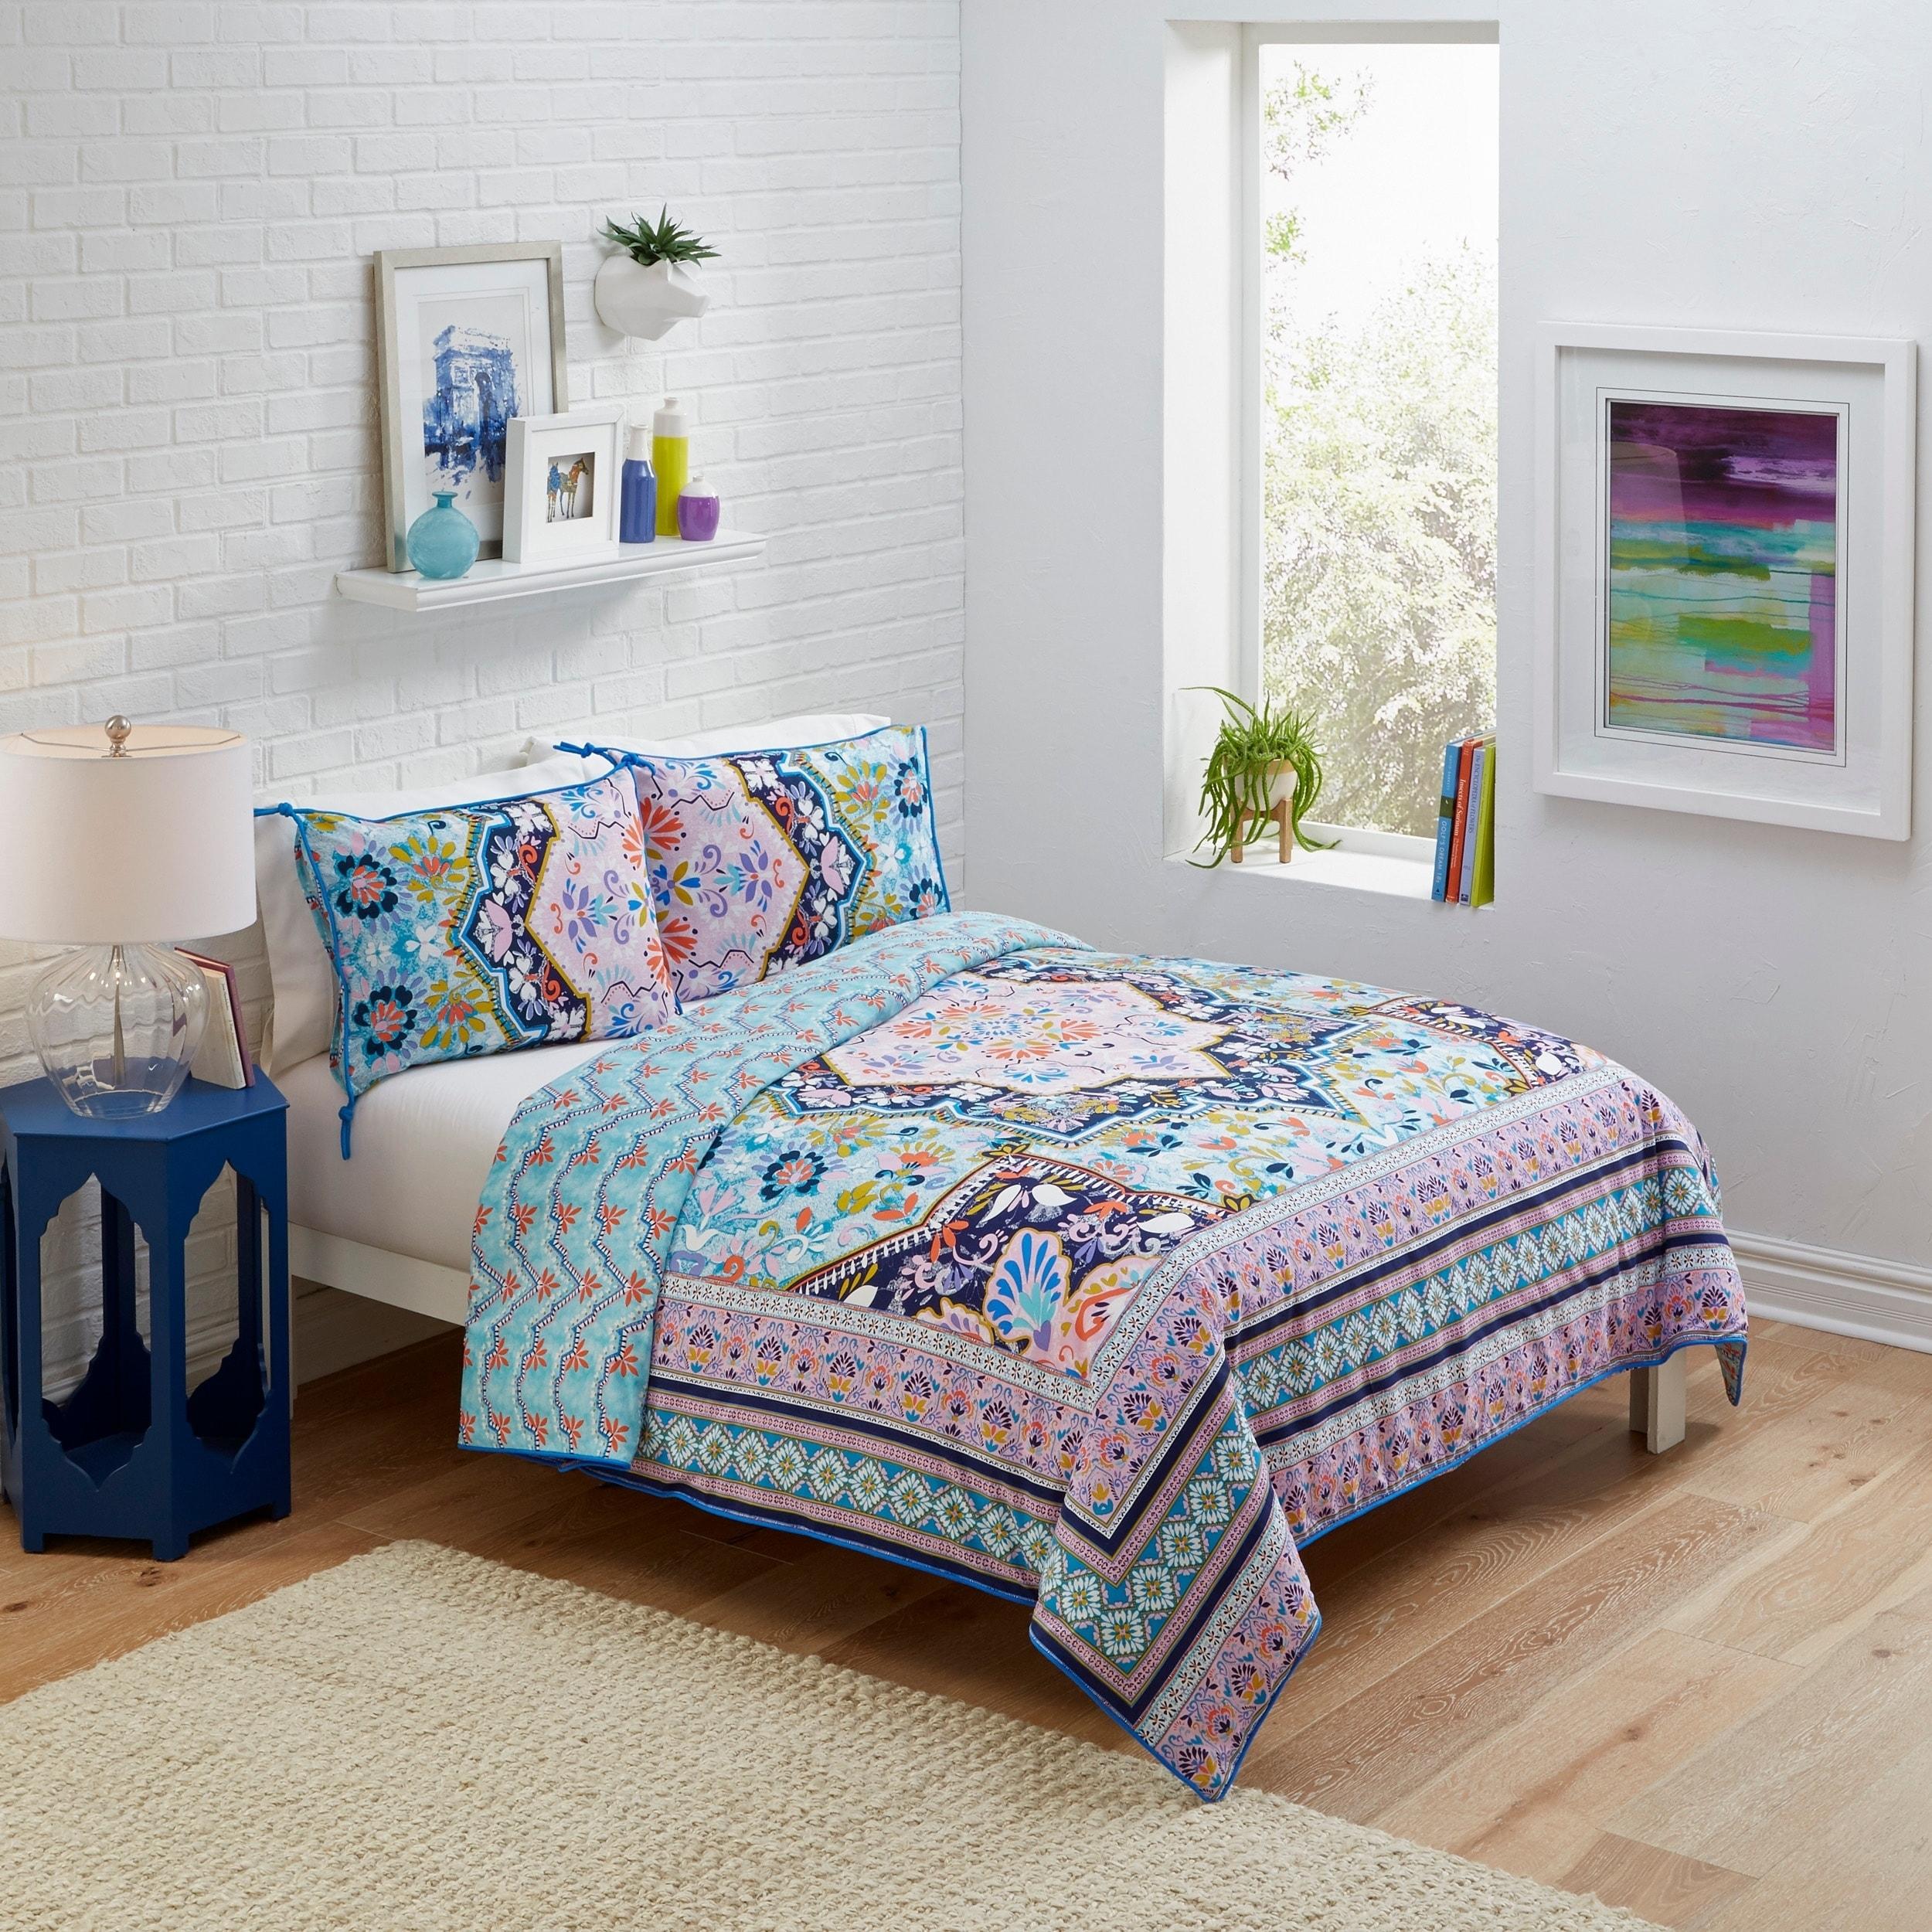 Boho Boutique Kasbah 3 Piece Reversible Comforter Set (Ki...